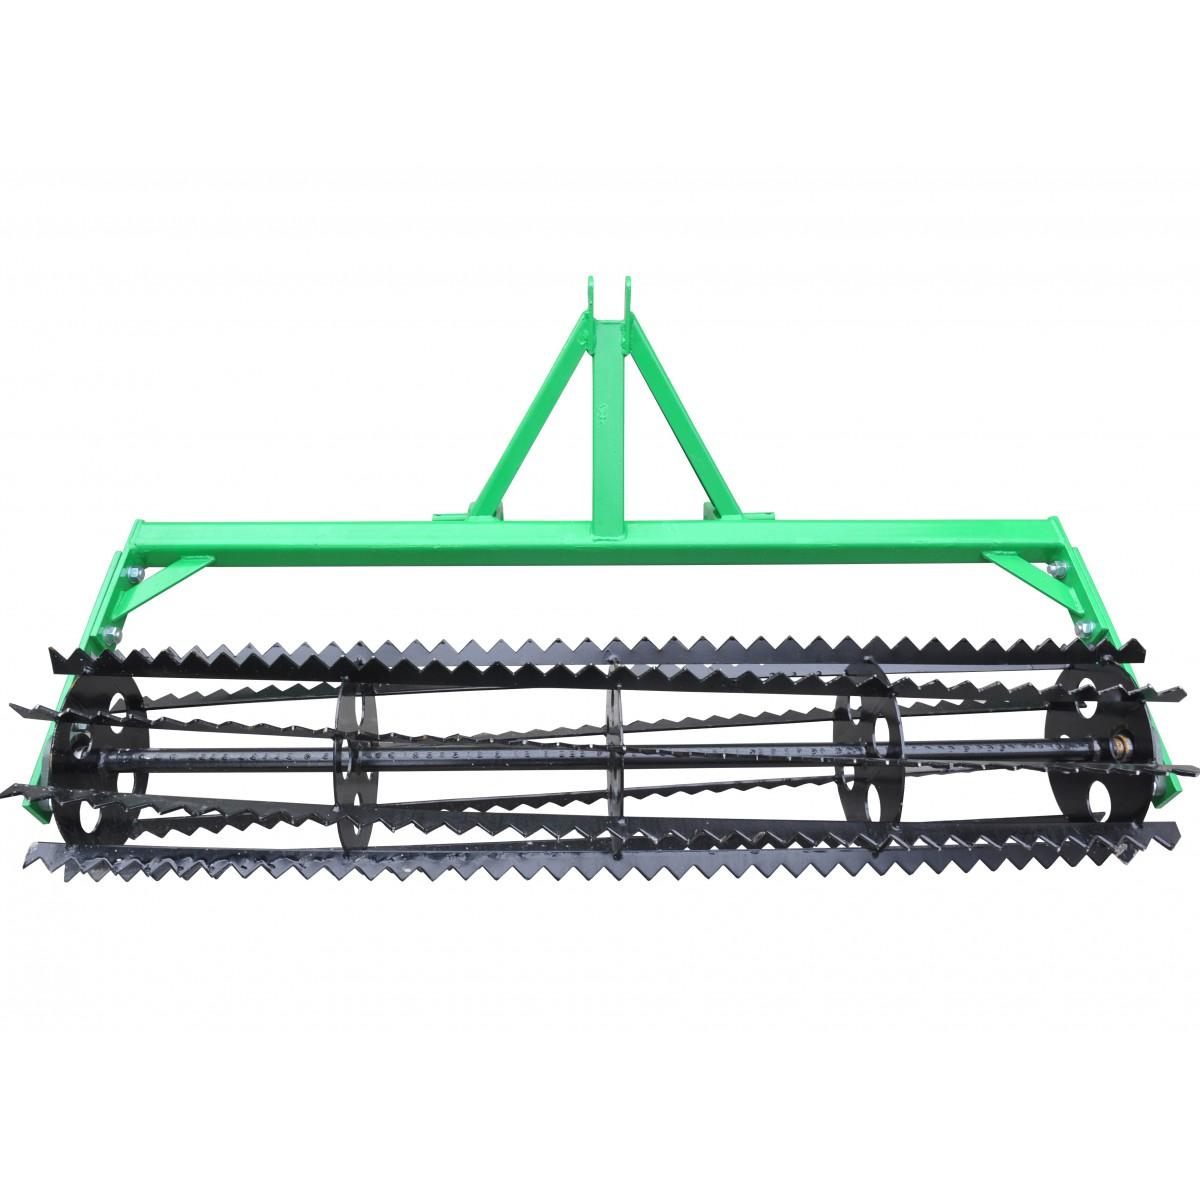 String roller for the cultivator 150 cm